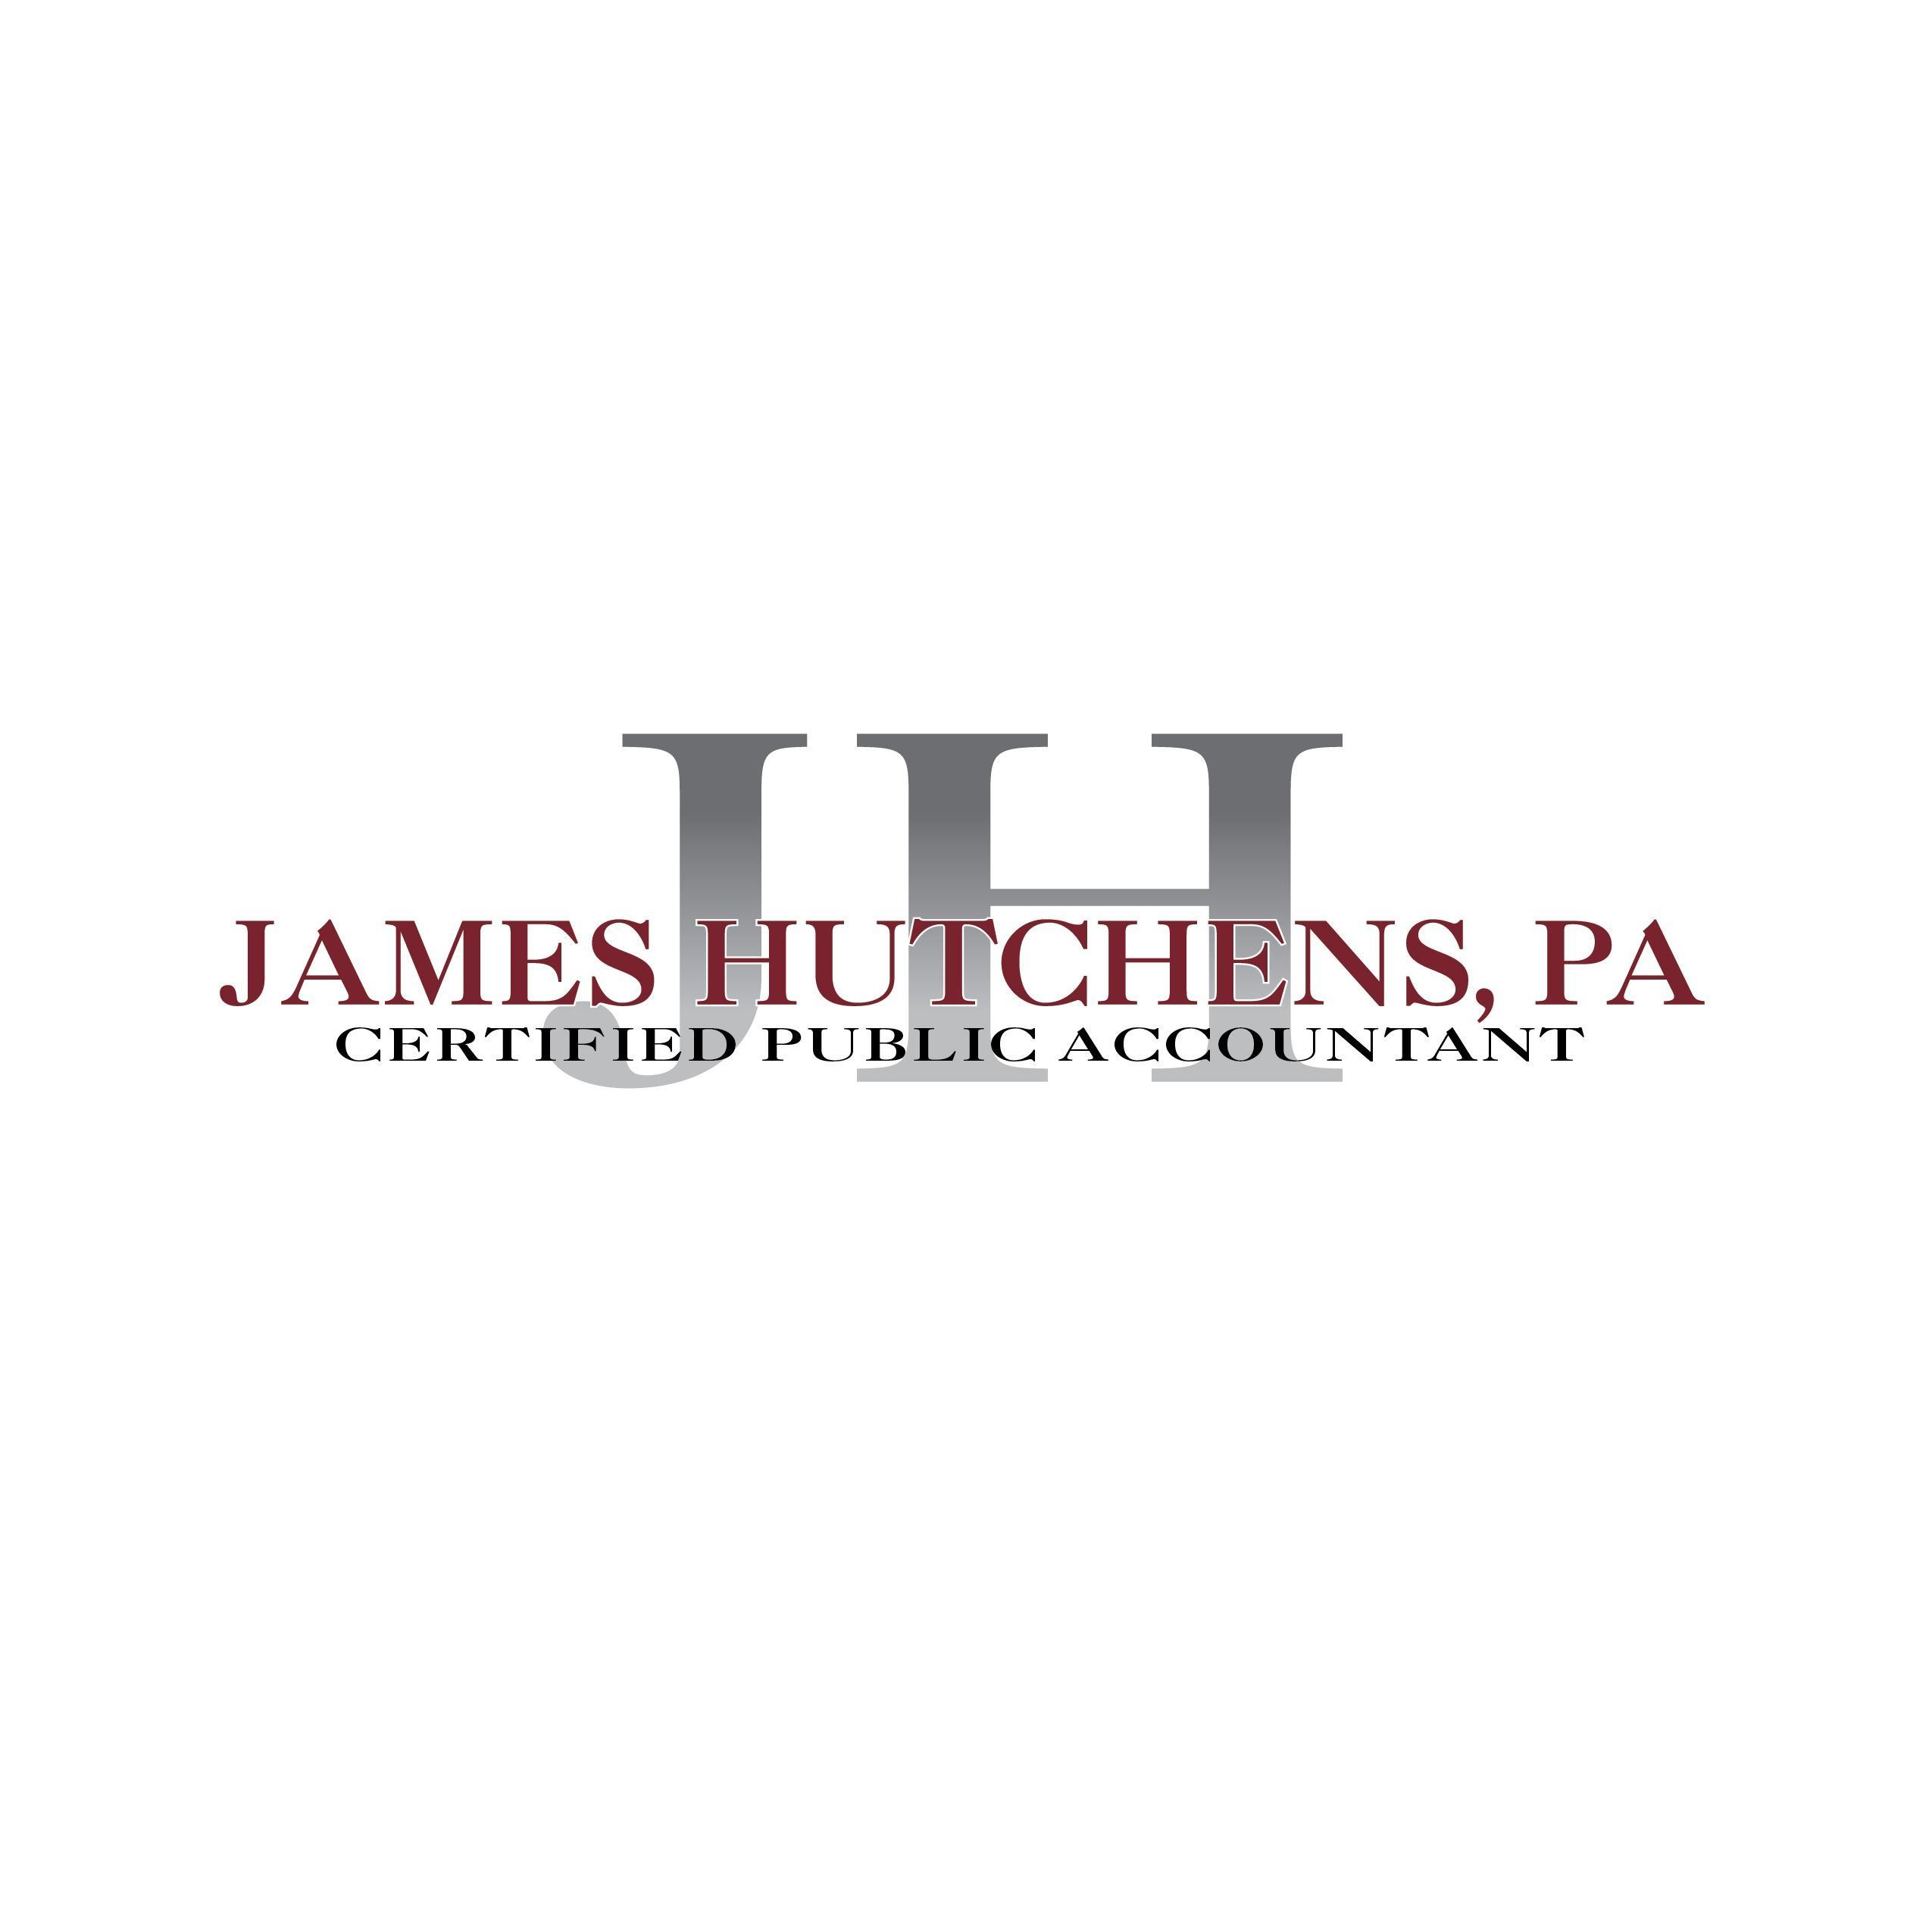 James Hutchens P.A. Certified Public Accountant